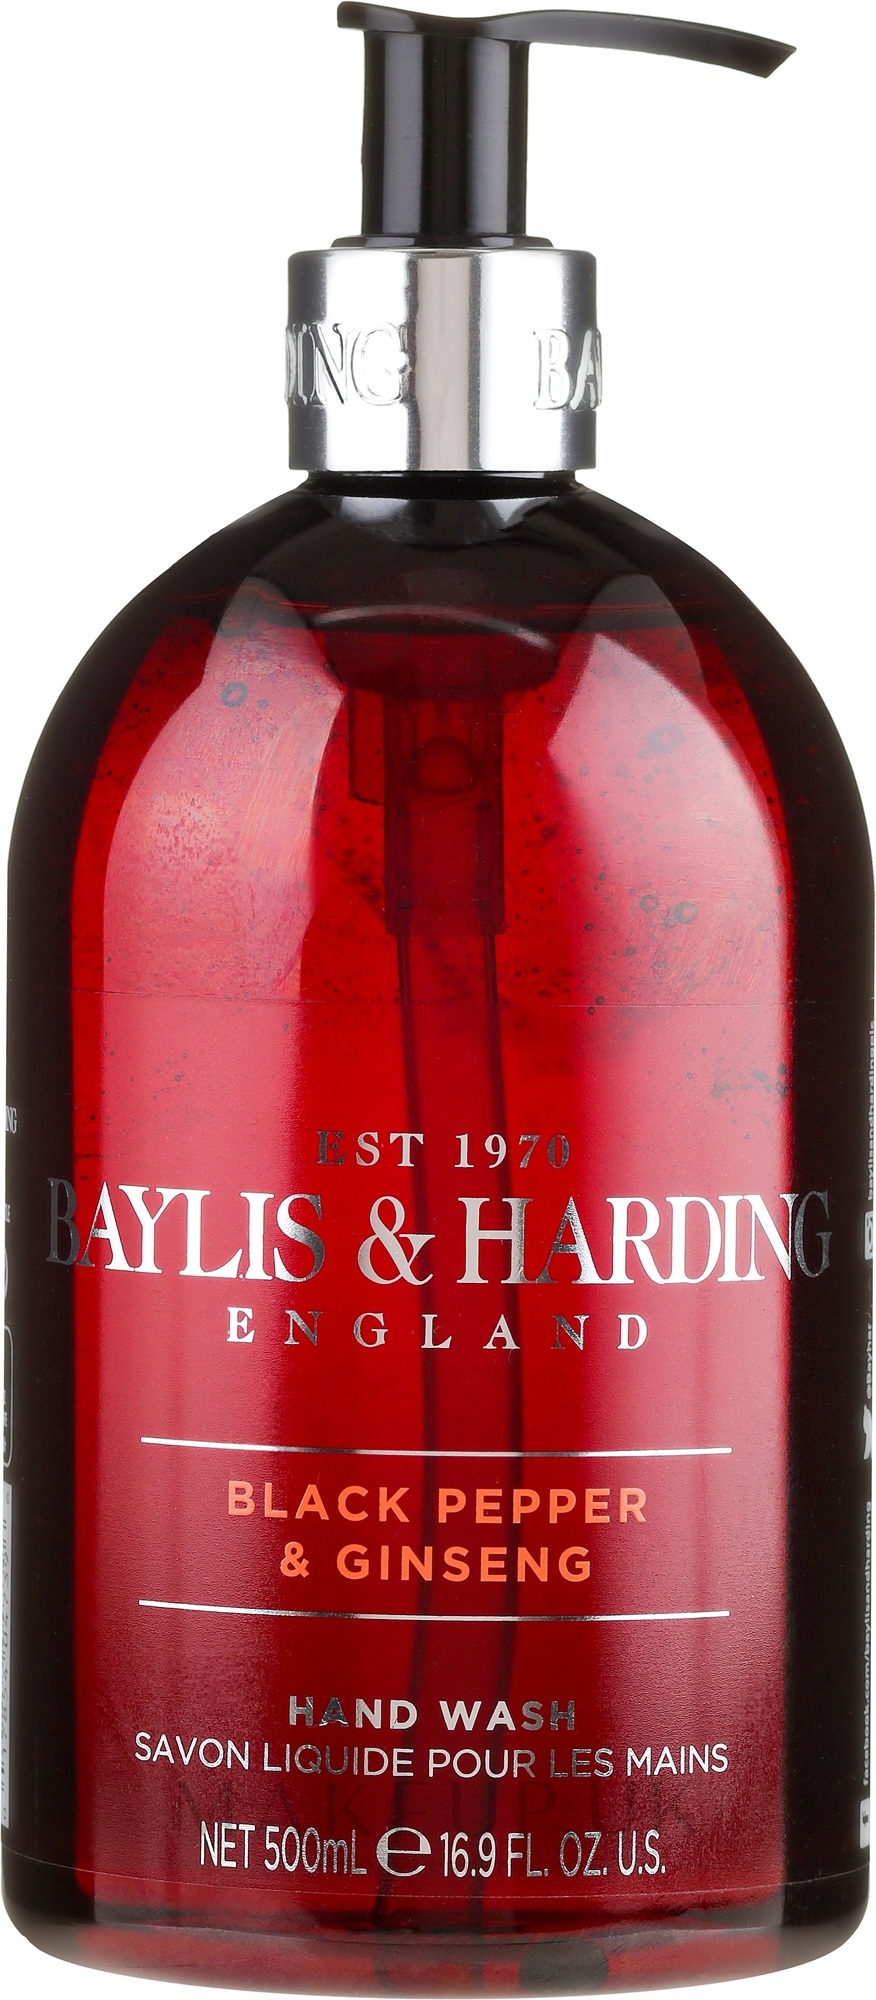 Hand Liquid Soap - Baylis & Harding Black Pepper & Ginseng Hand Wash — photo 500 ml